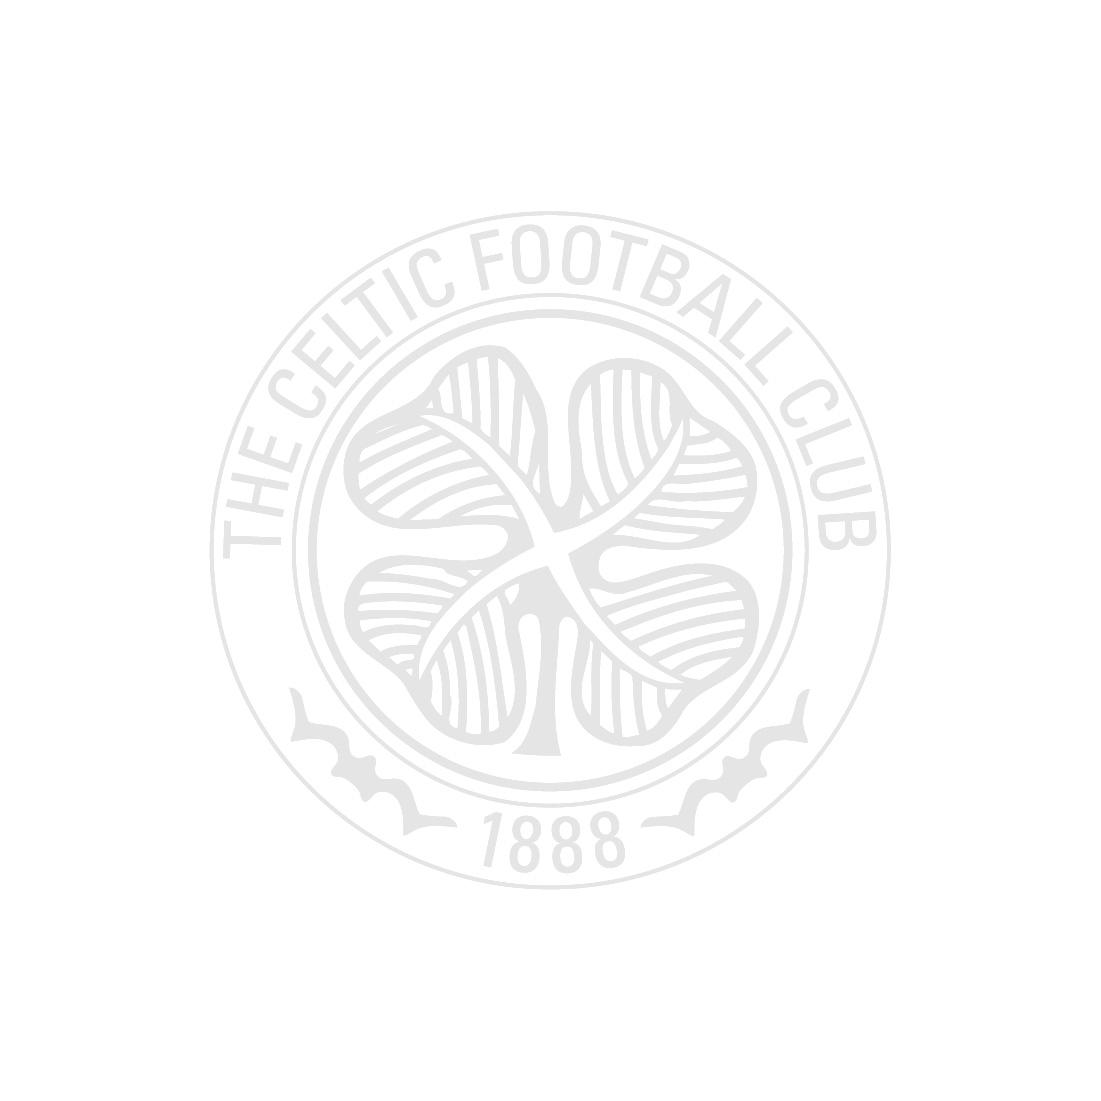 Celtic Away Kit Wristband